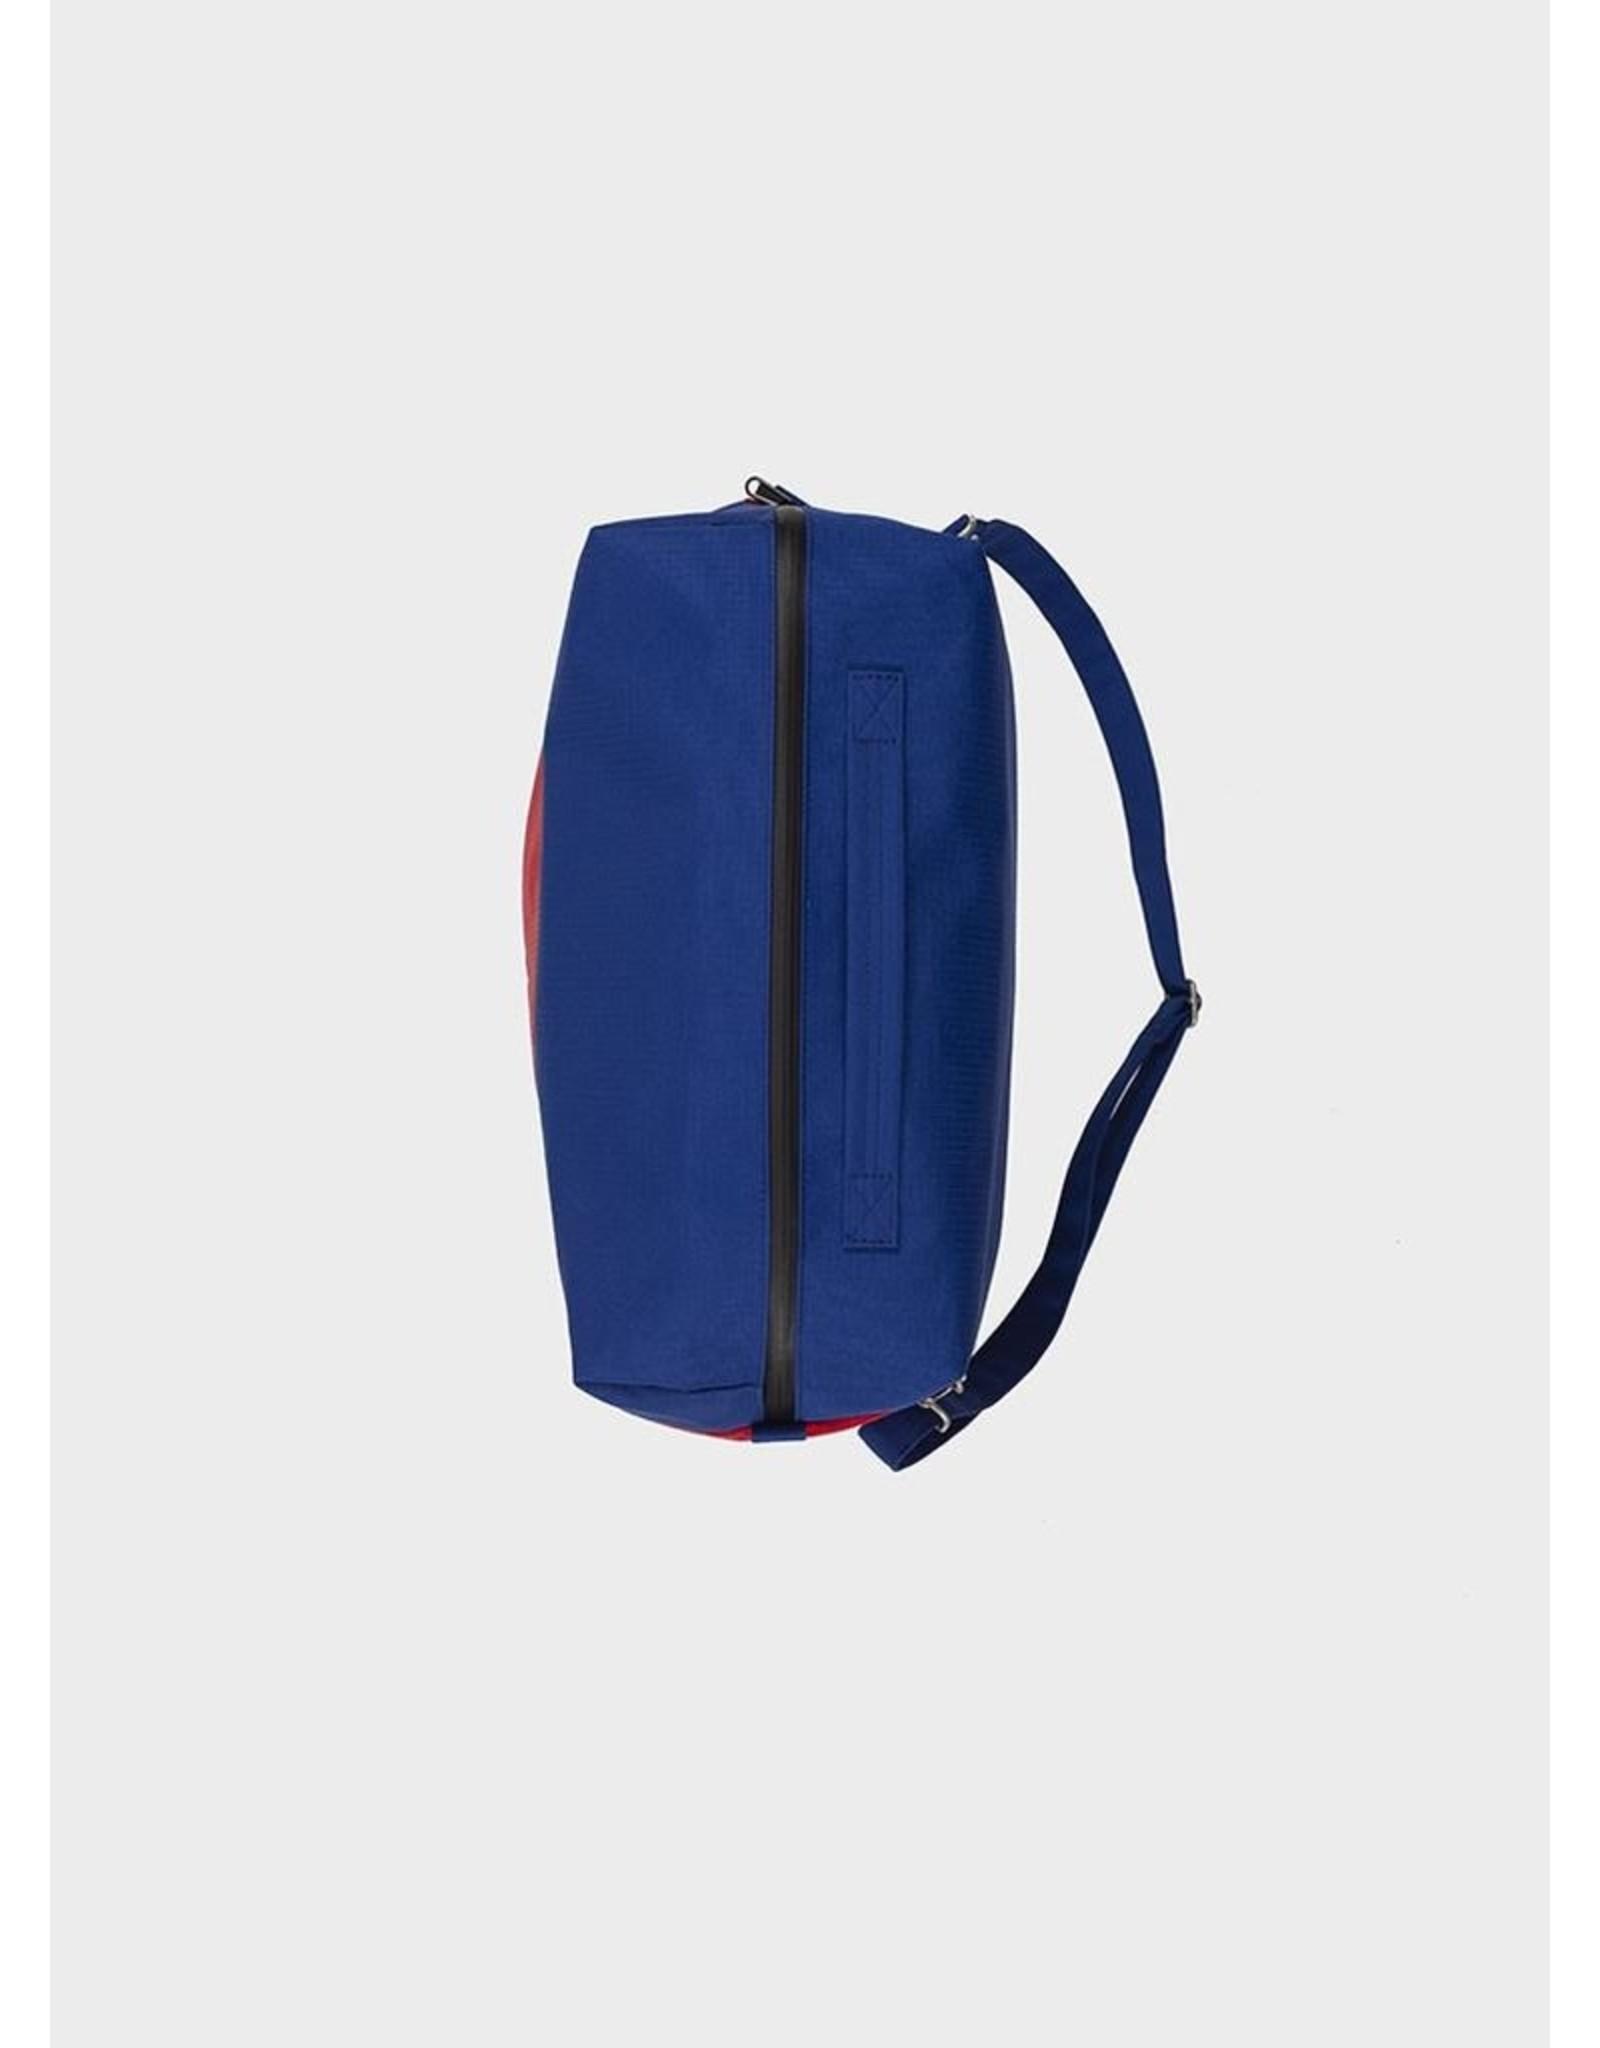 Susan Bijl 24/7 Bag - Electric Blue & Redlight - Overnight bag - 39,5 x 18 x 28 cm - 20l - Waterproof